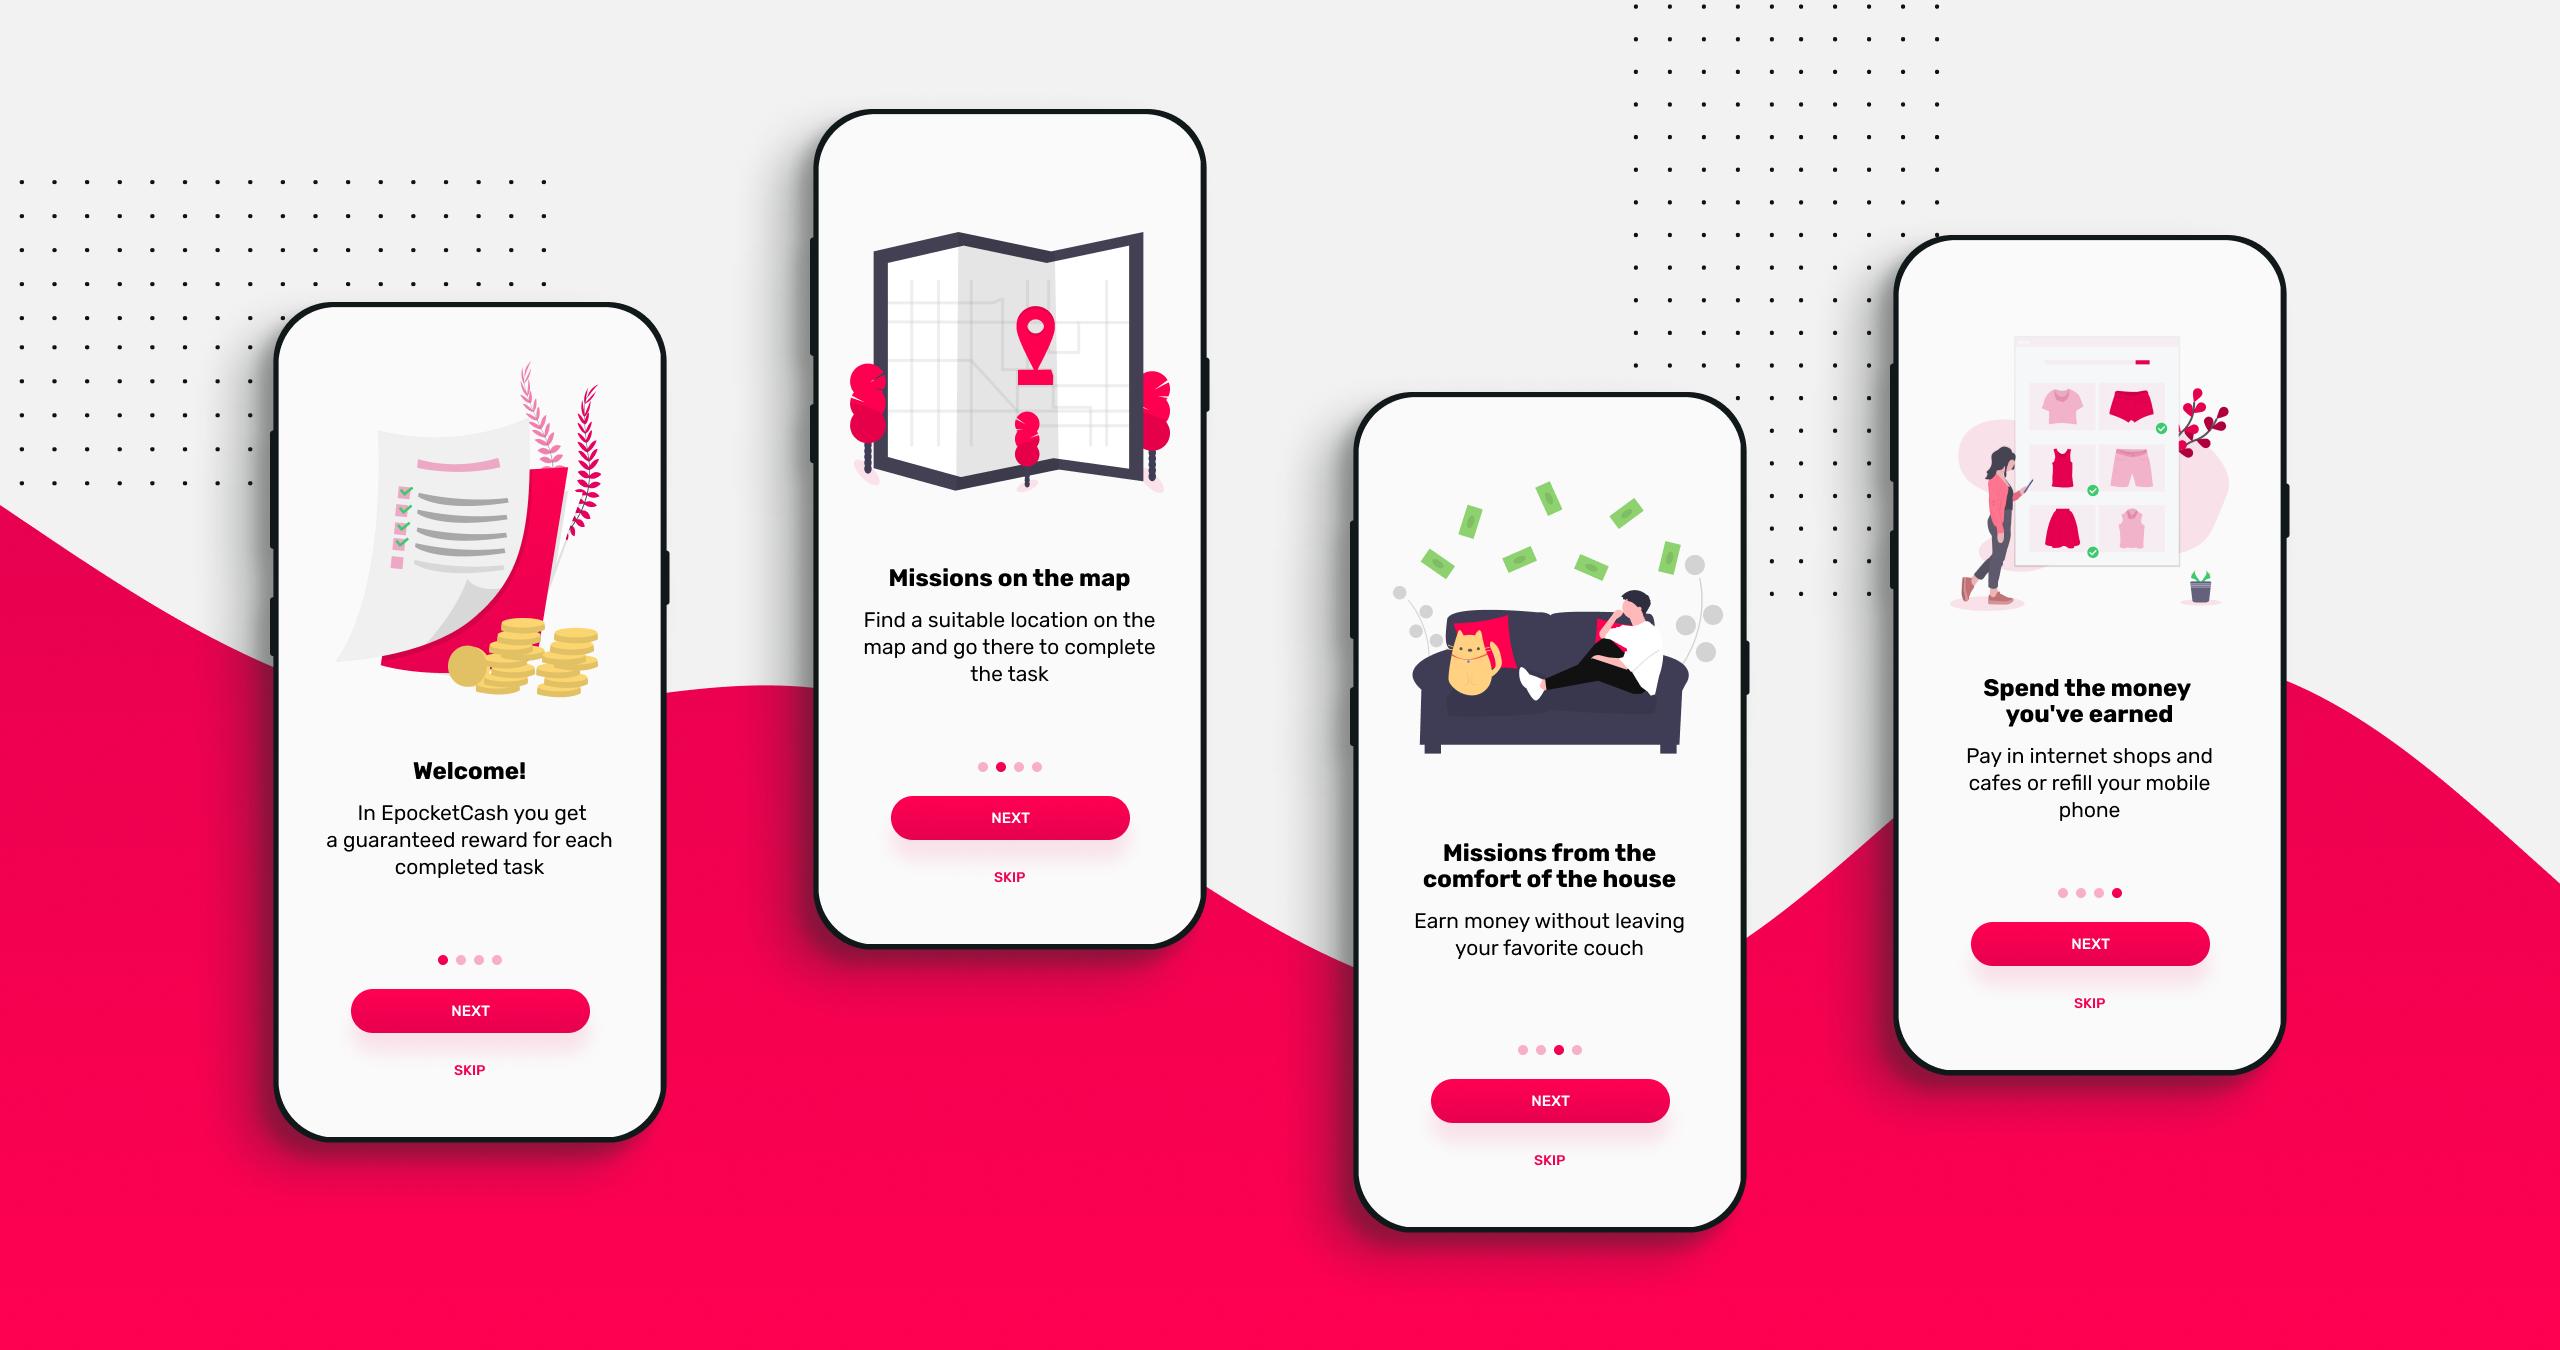 epocketcash mobile application